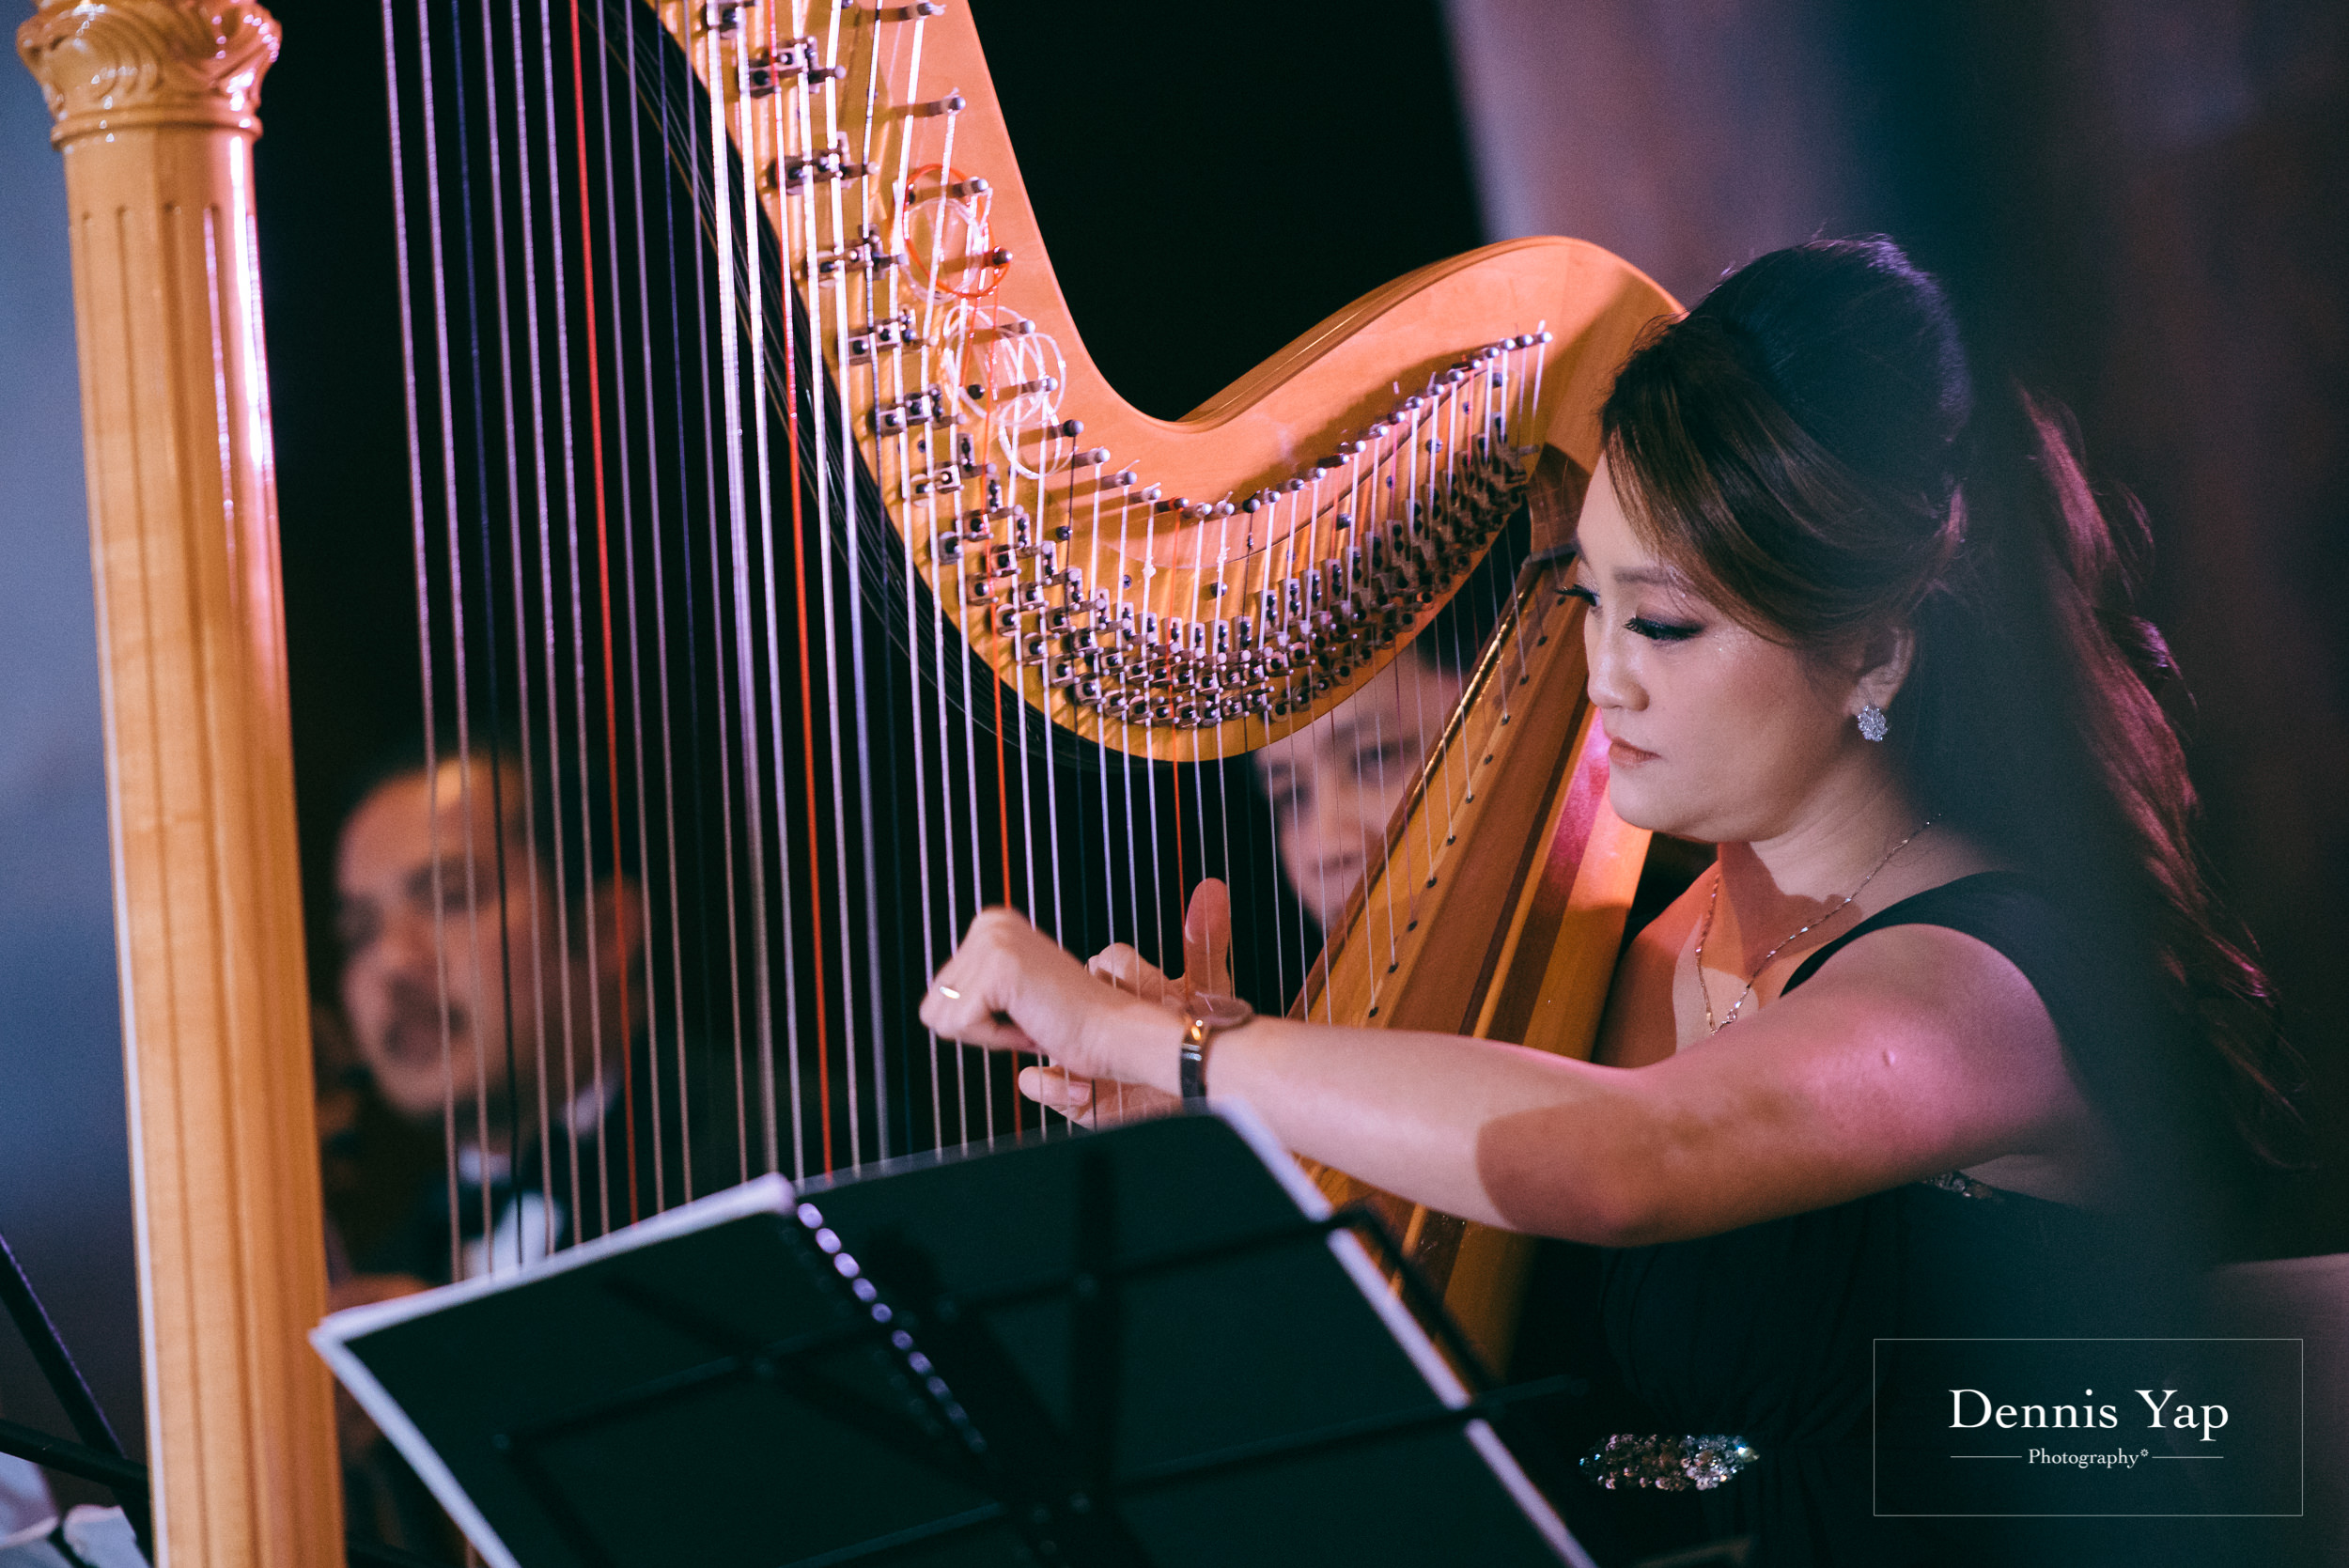 nelson bee yi wedding banquet grand hyatt kuala lumpur dennis yap photography jovita lo wedding-7.jpg